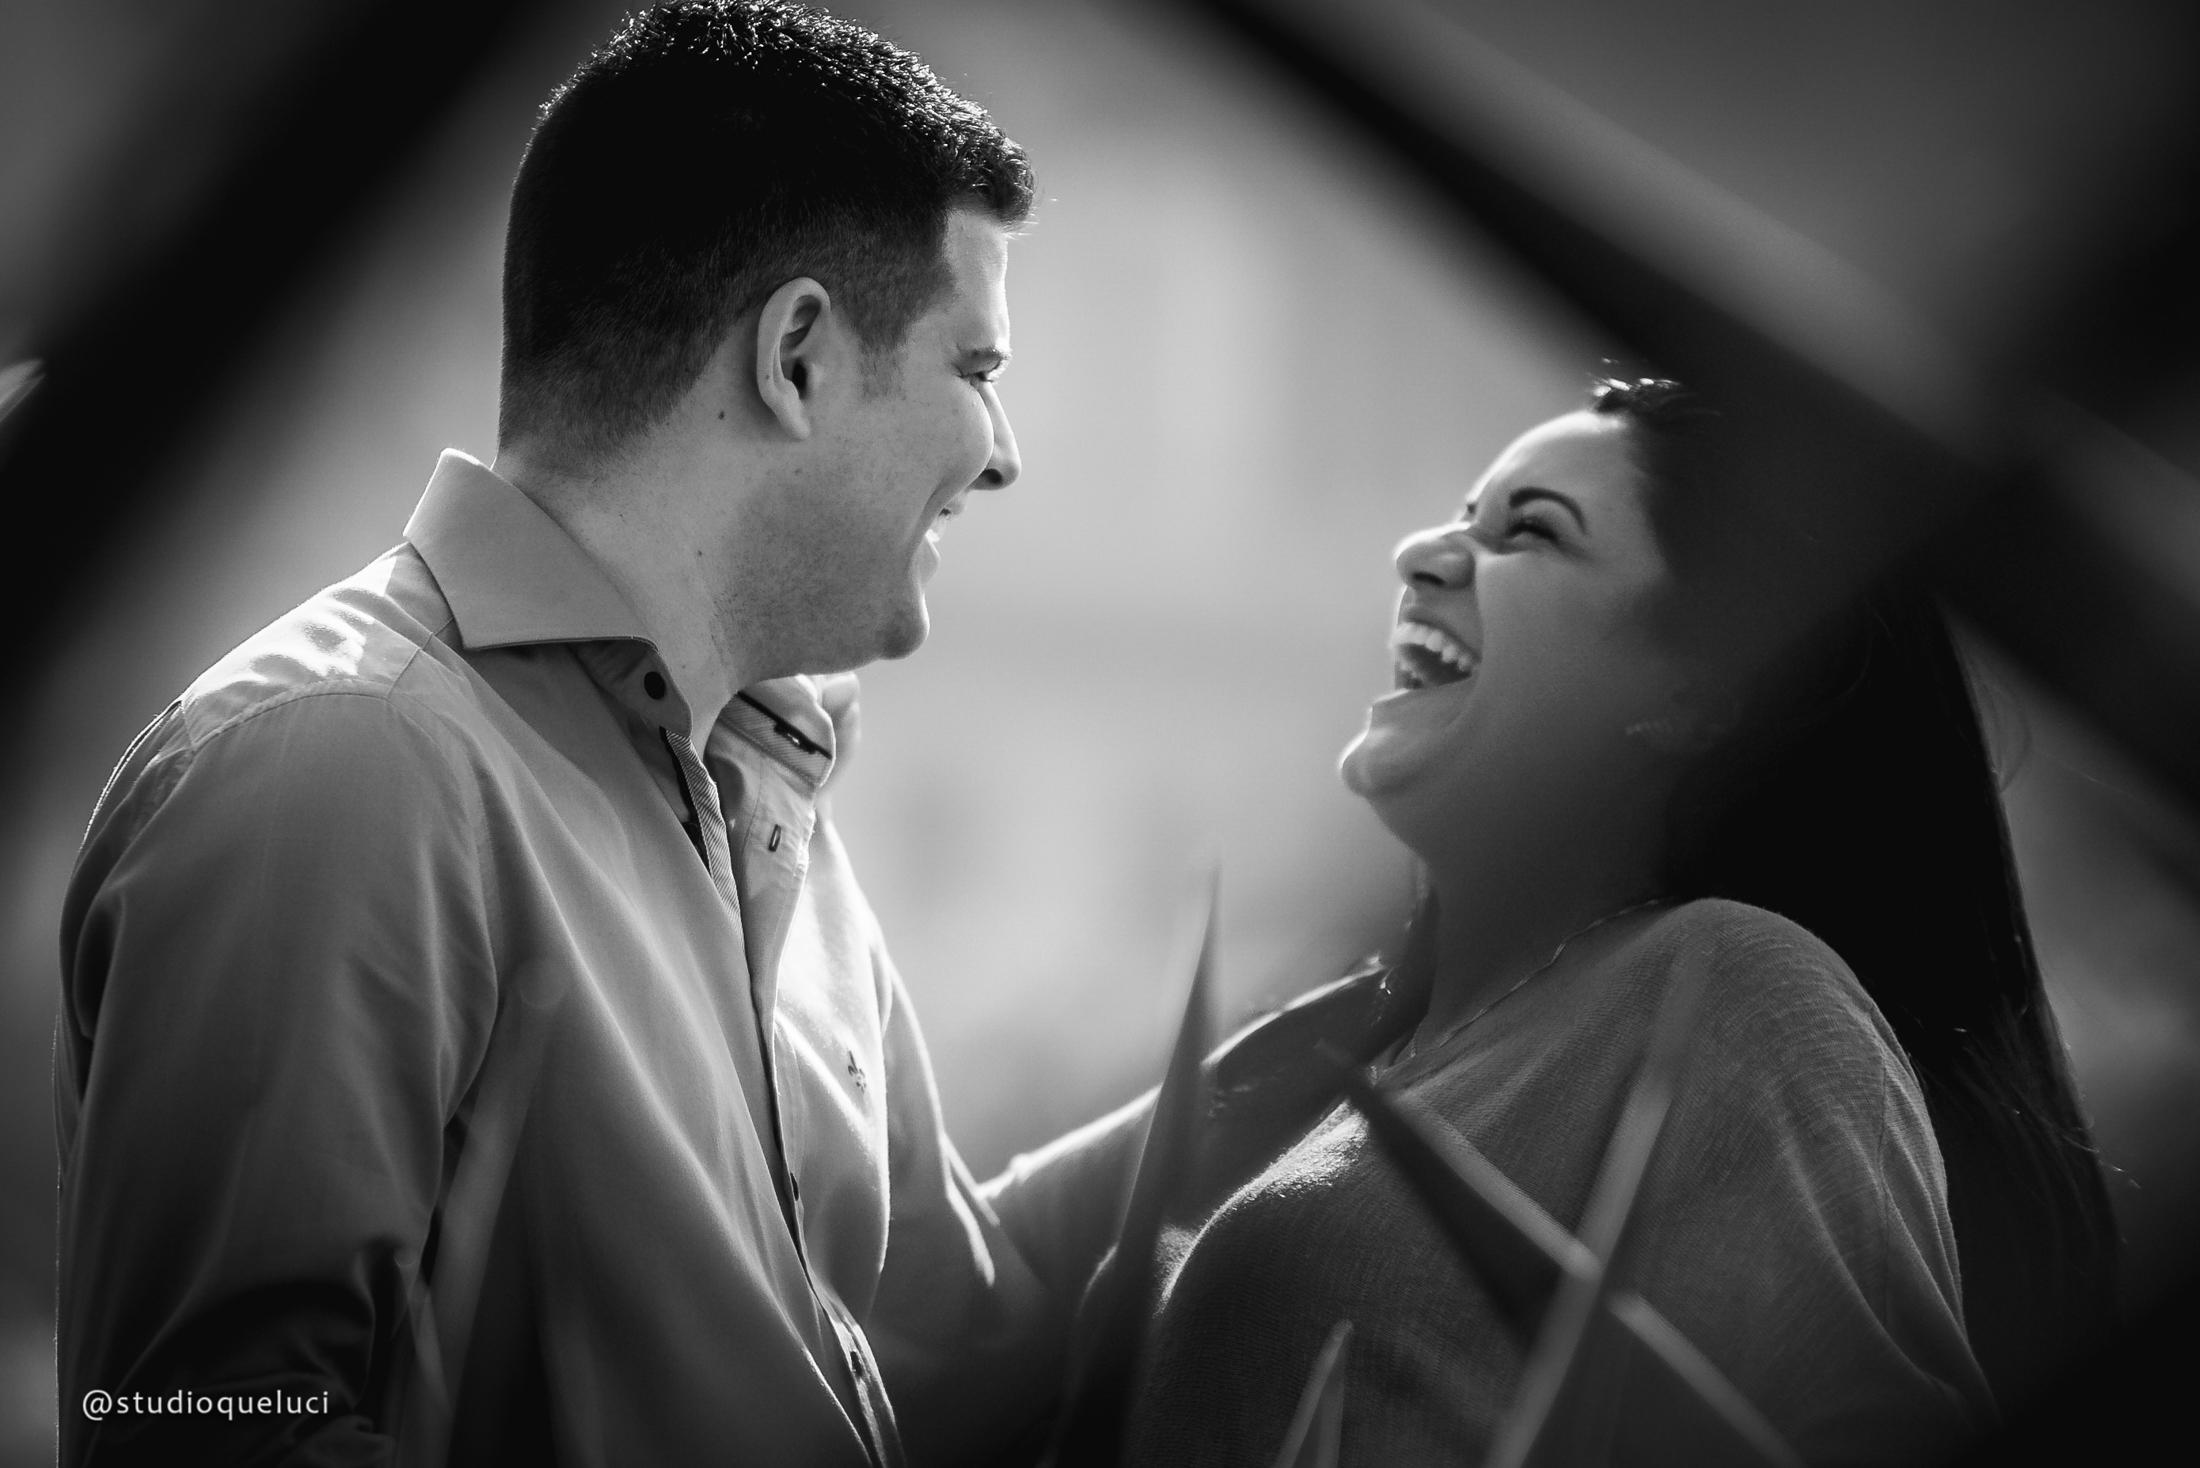 fotografia de casamento ensaio pre wedding (5)